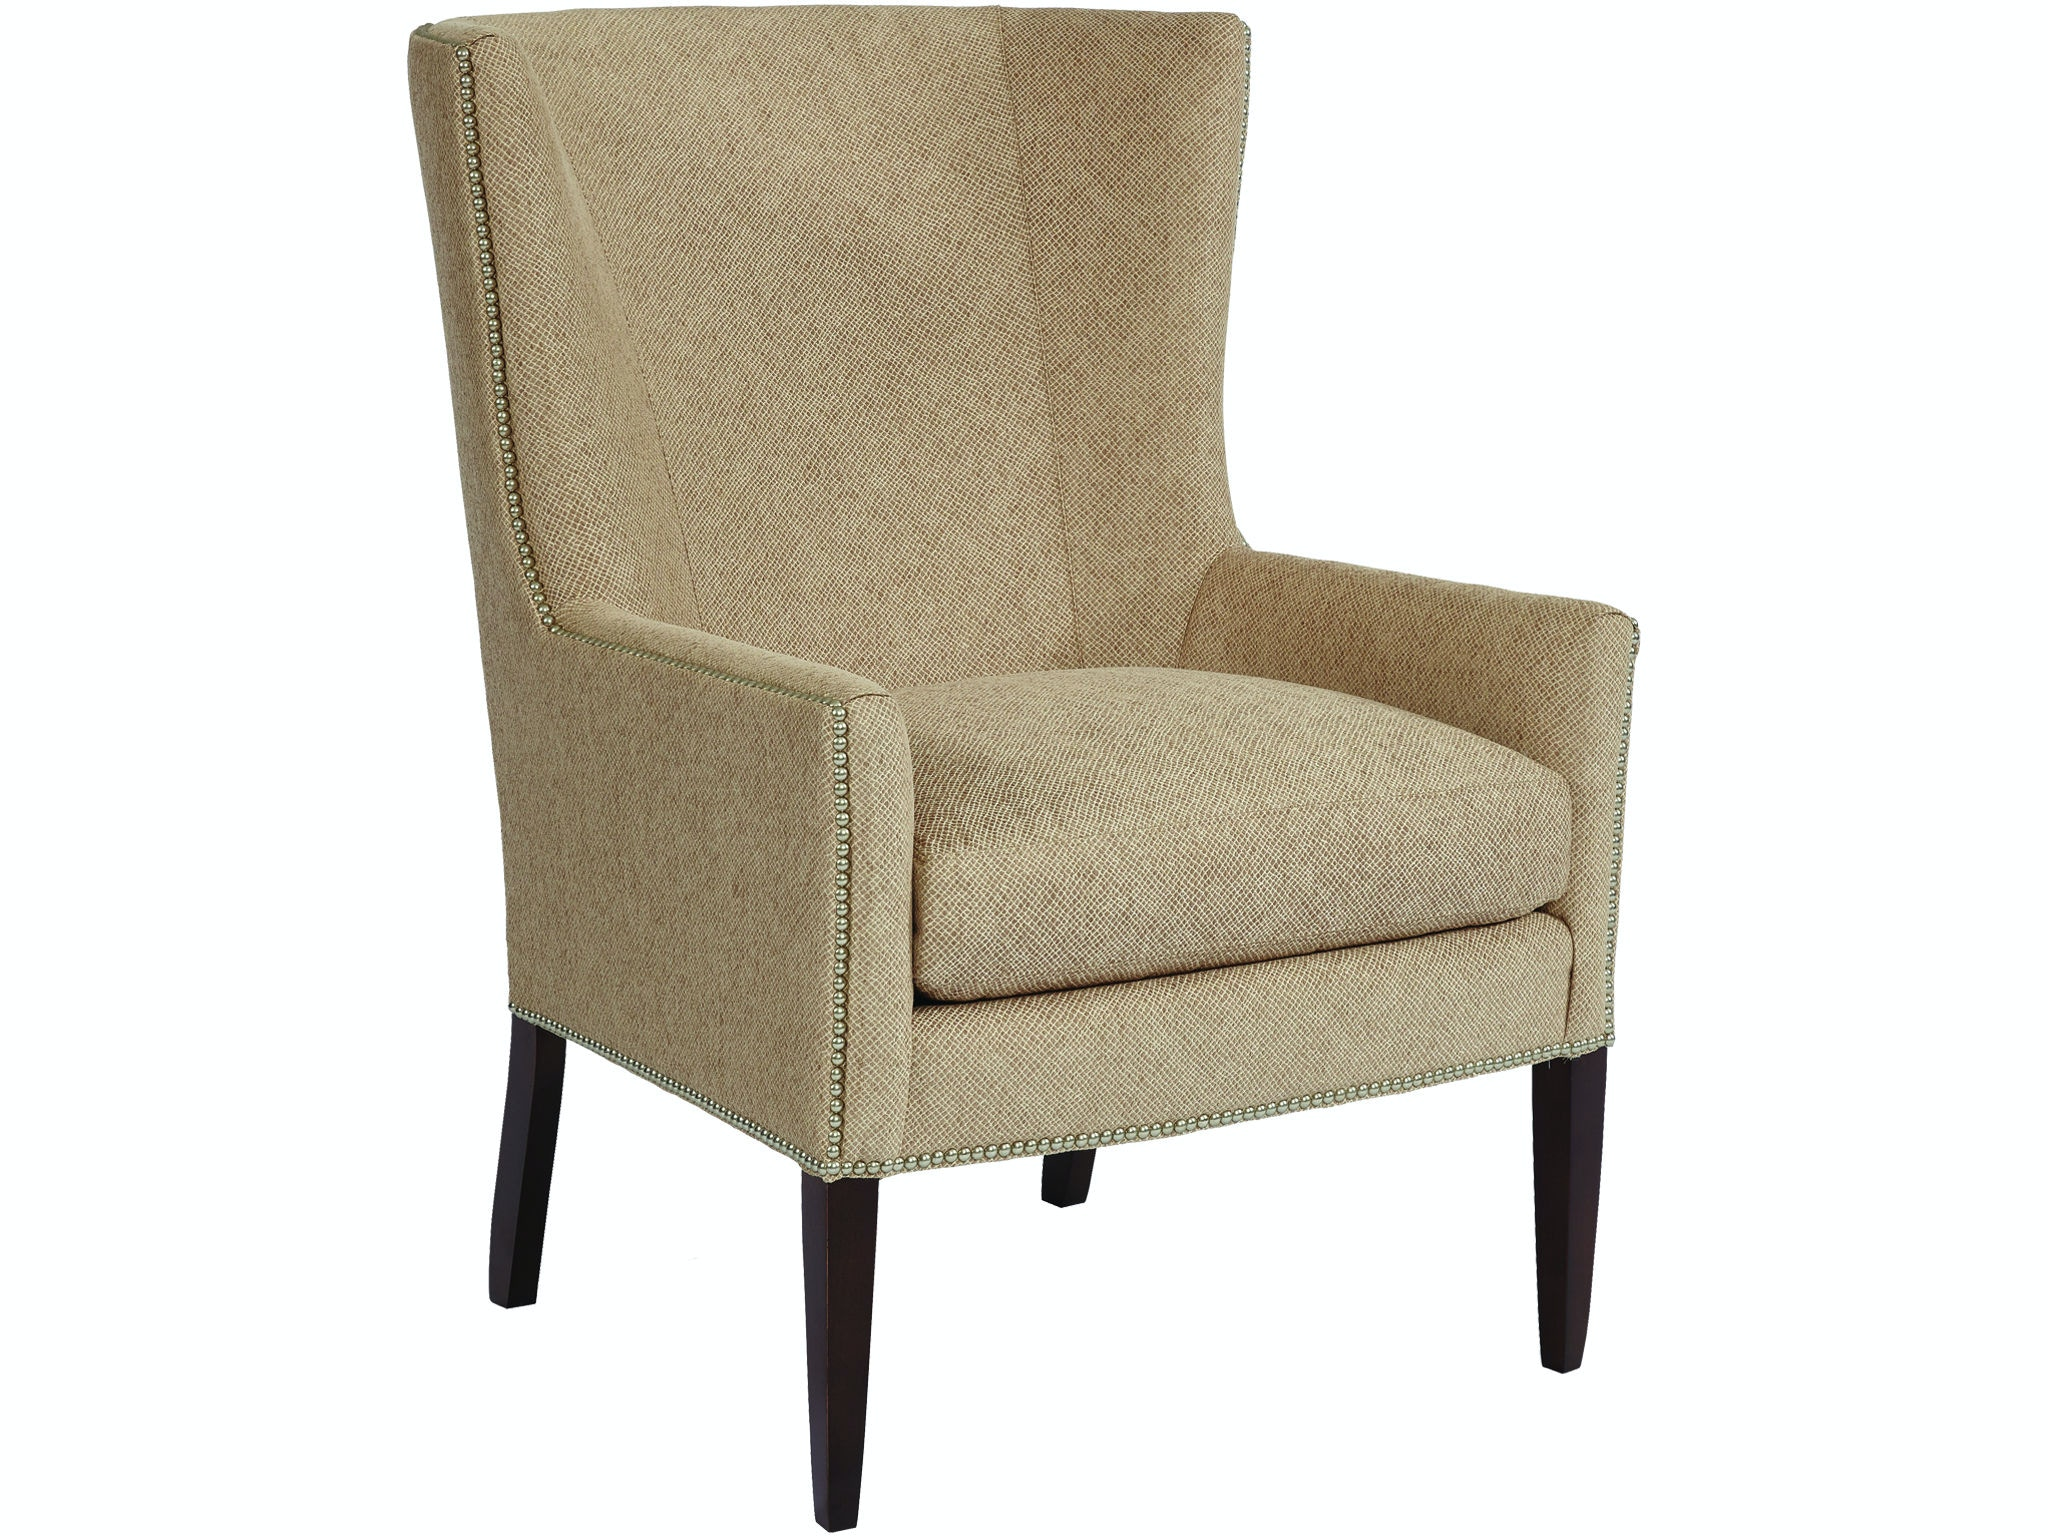 Incroyable 1618 1. Chair